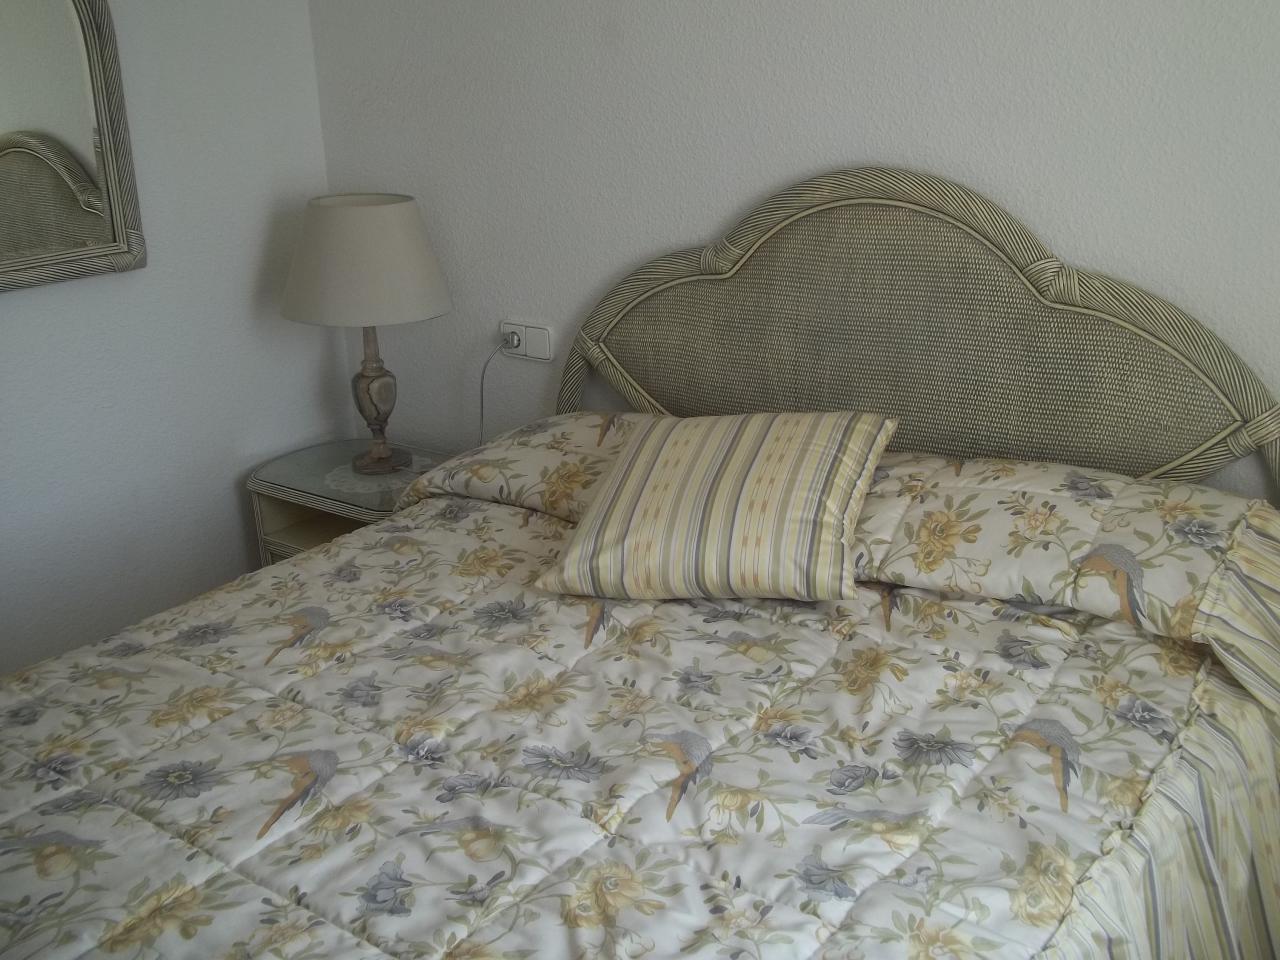 Appartement de vacances Casa Mónica (809602), La Manga del Mar Menor, Costa Calida, Murcie, Espagne, image 23